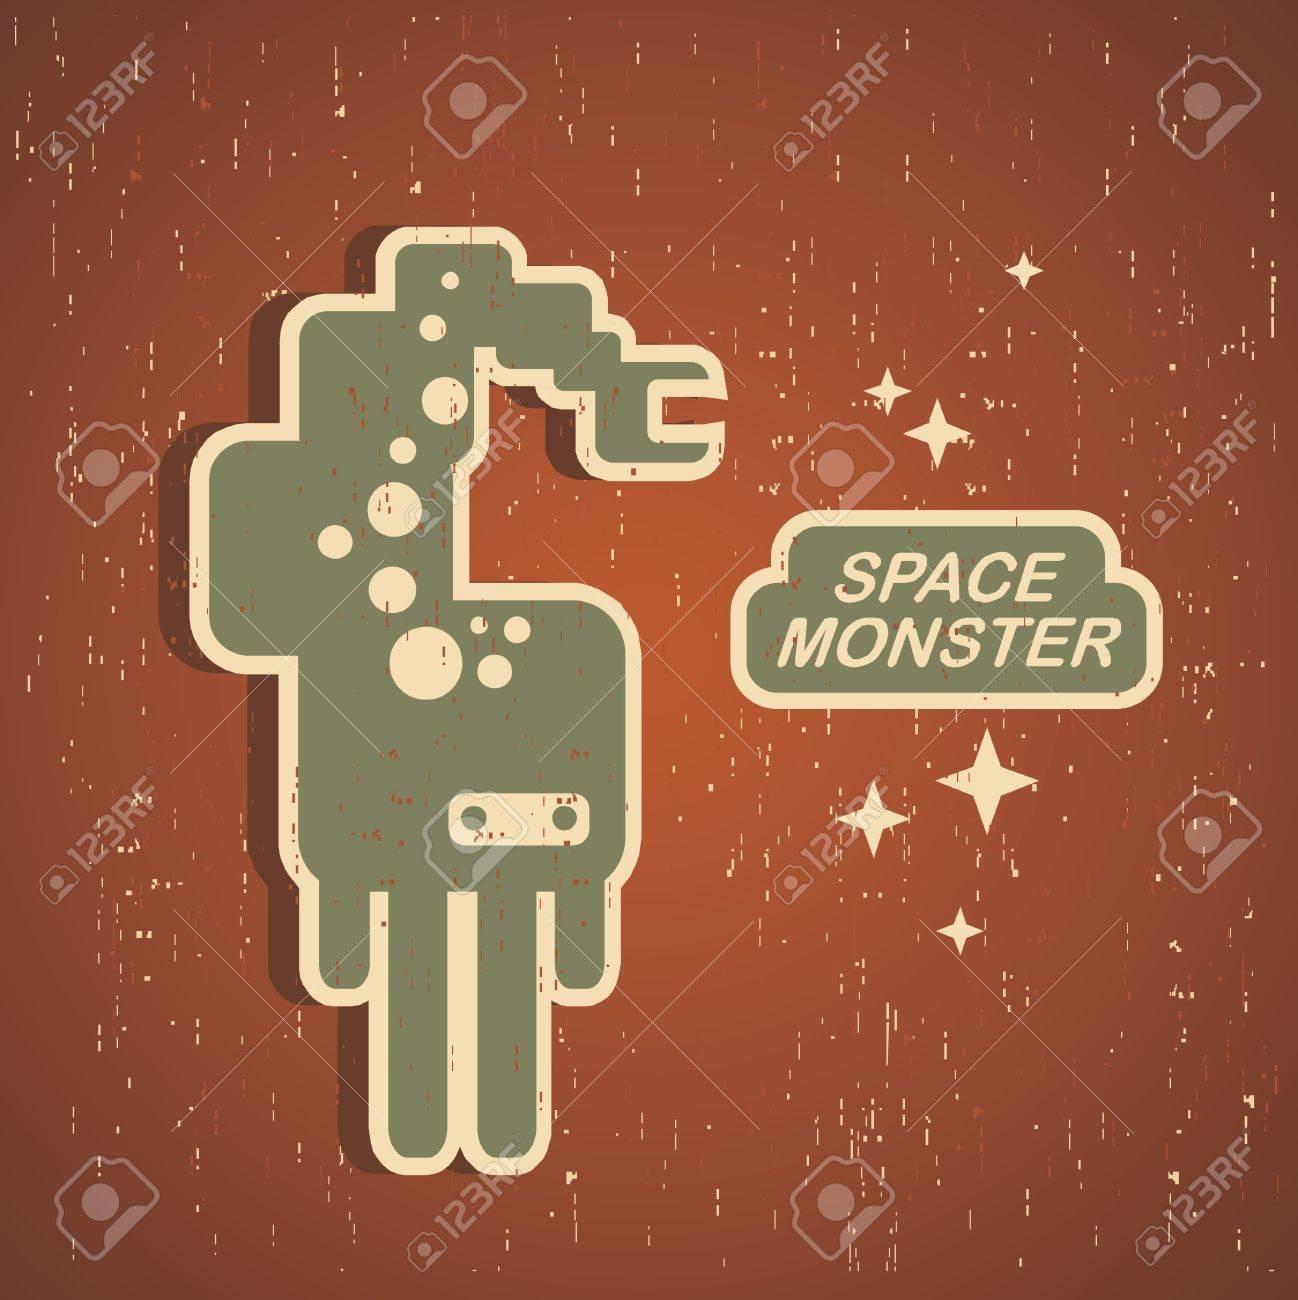 Vintage monster. Retro robot illustration Stock Vector - 14926526